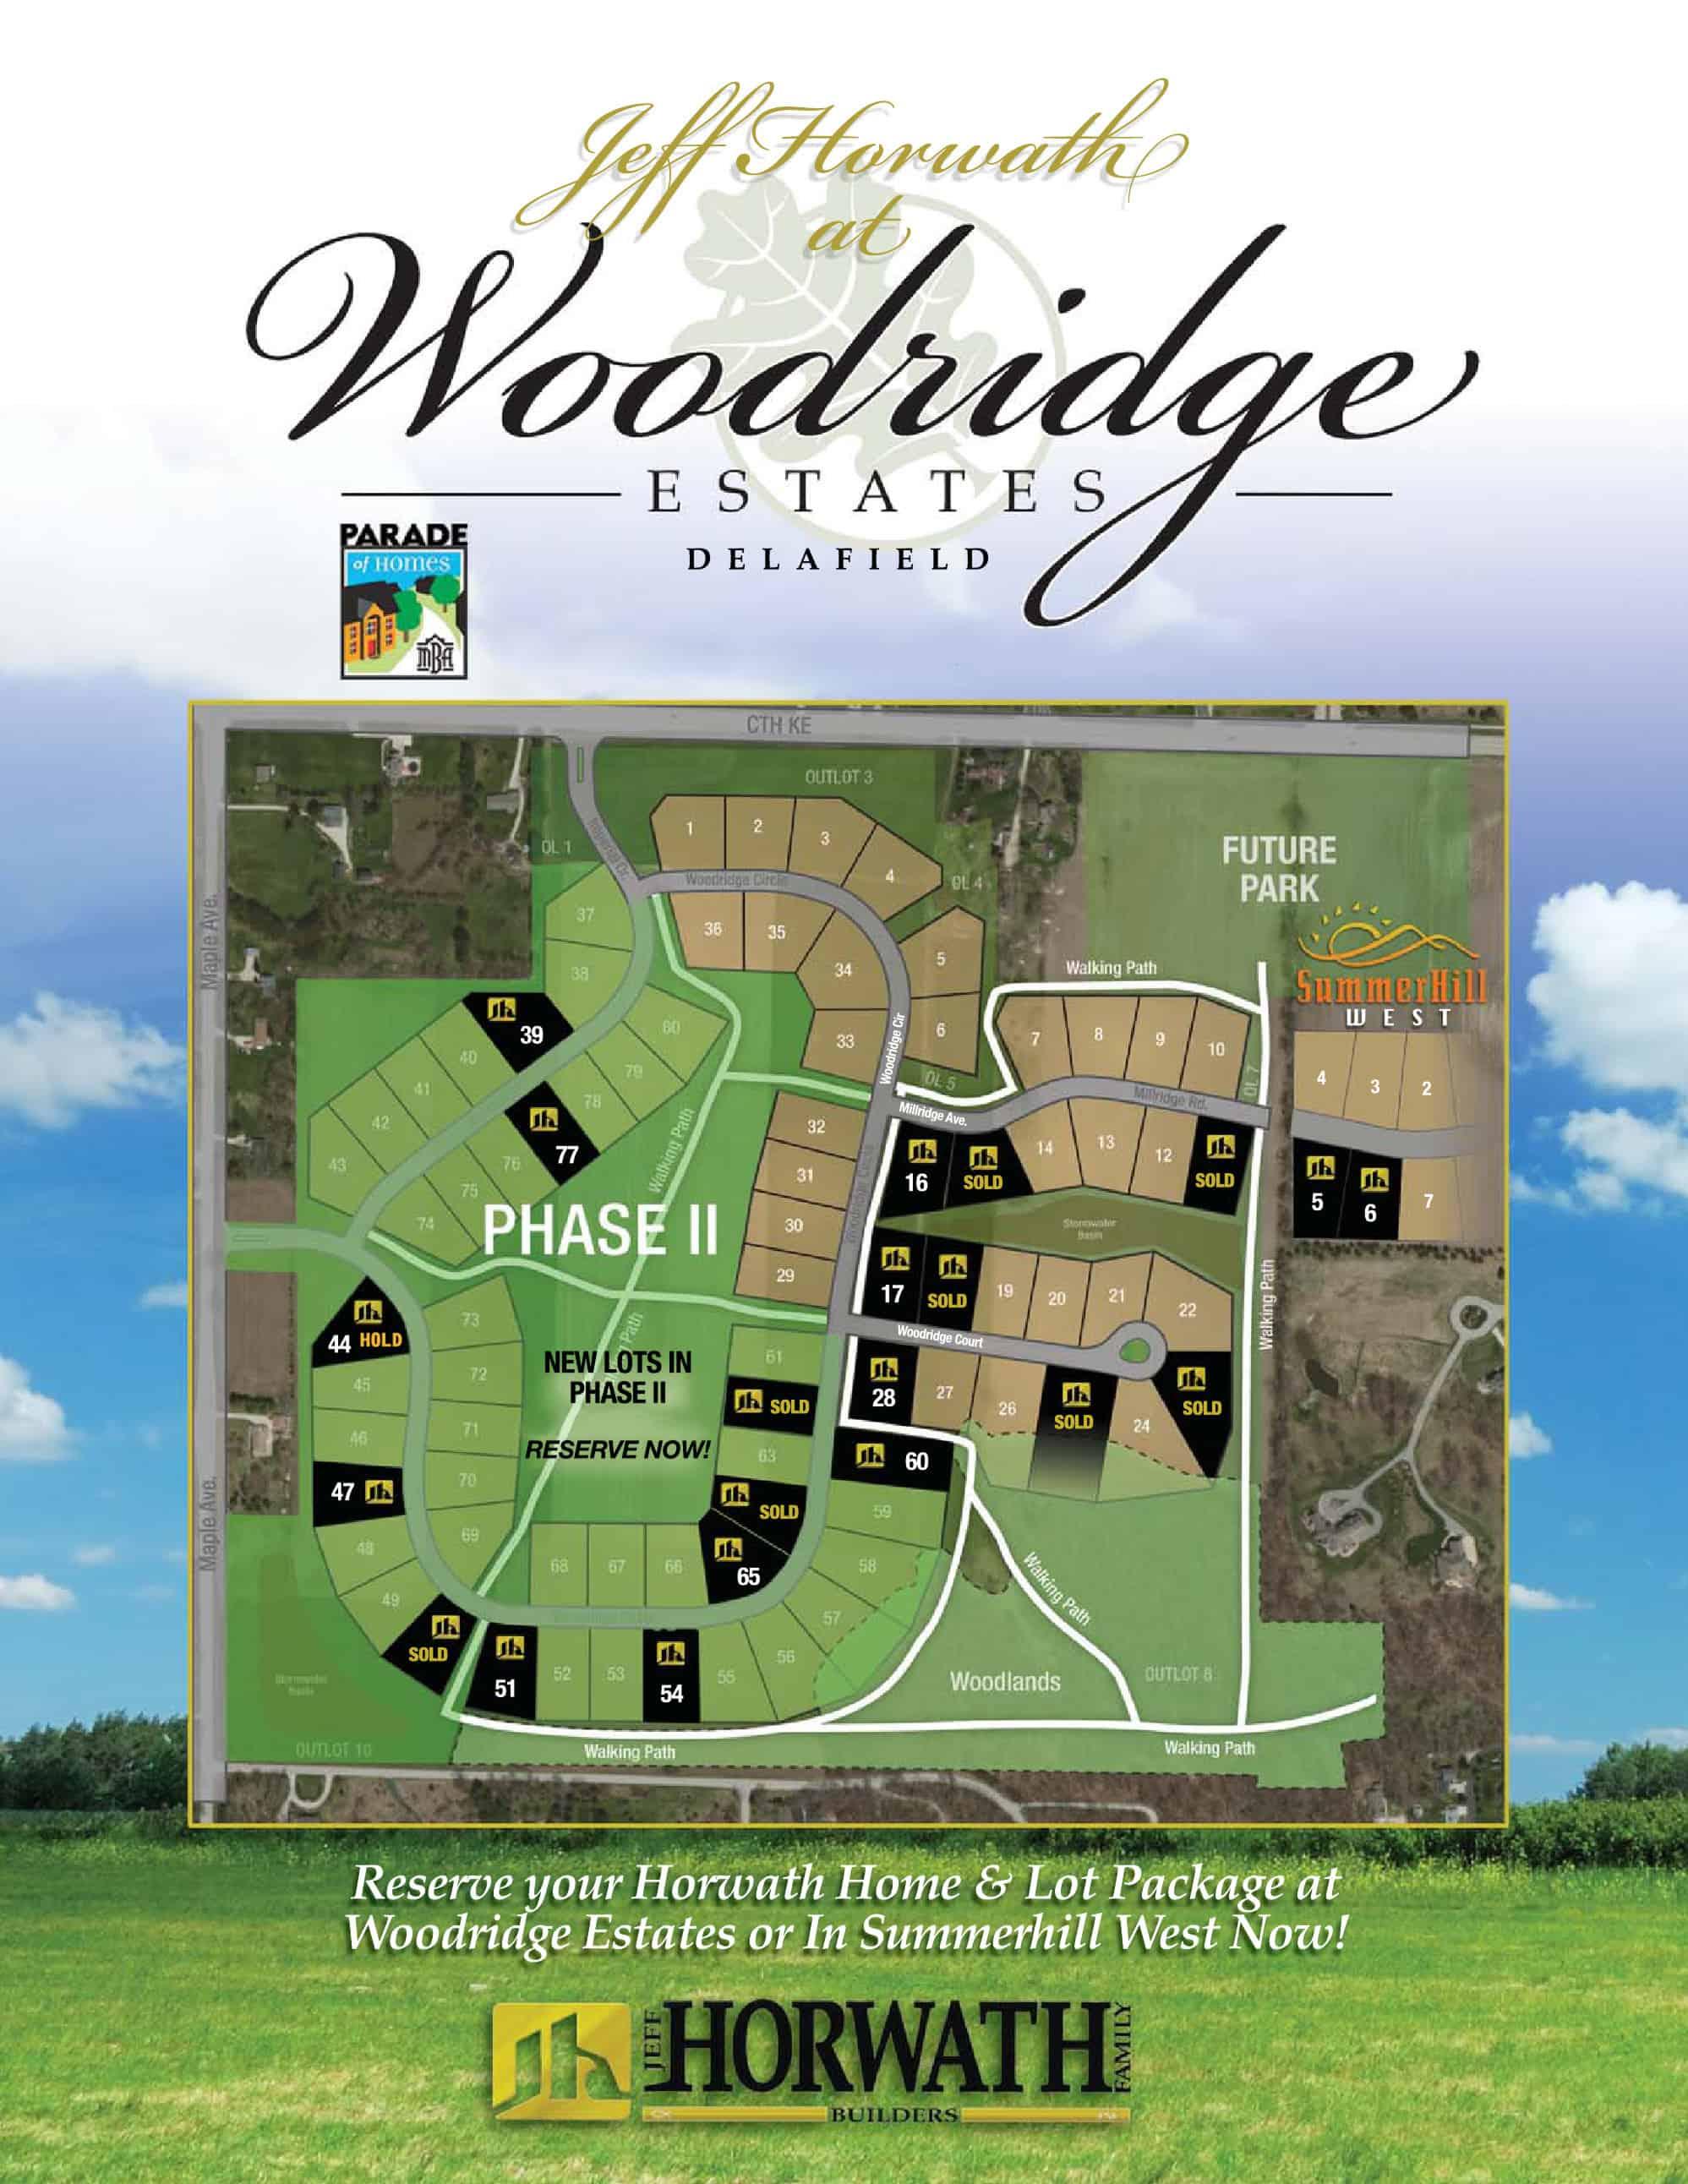 Woodridge estatesjeff horwath milwaukee waukesha and for Wind mobile family plan